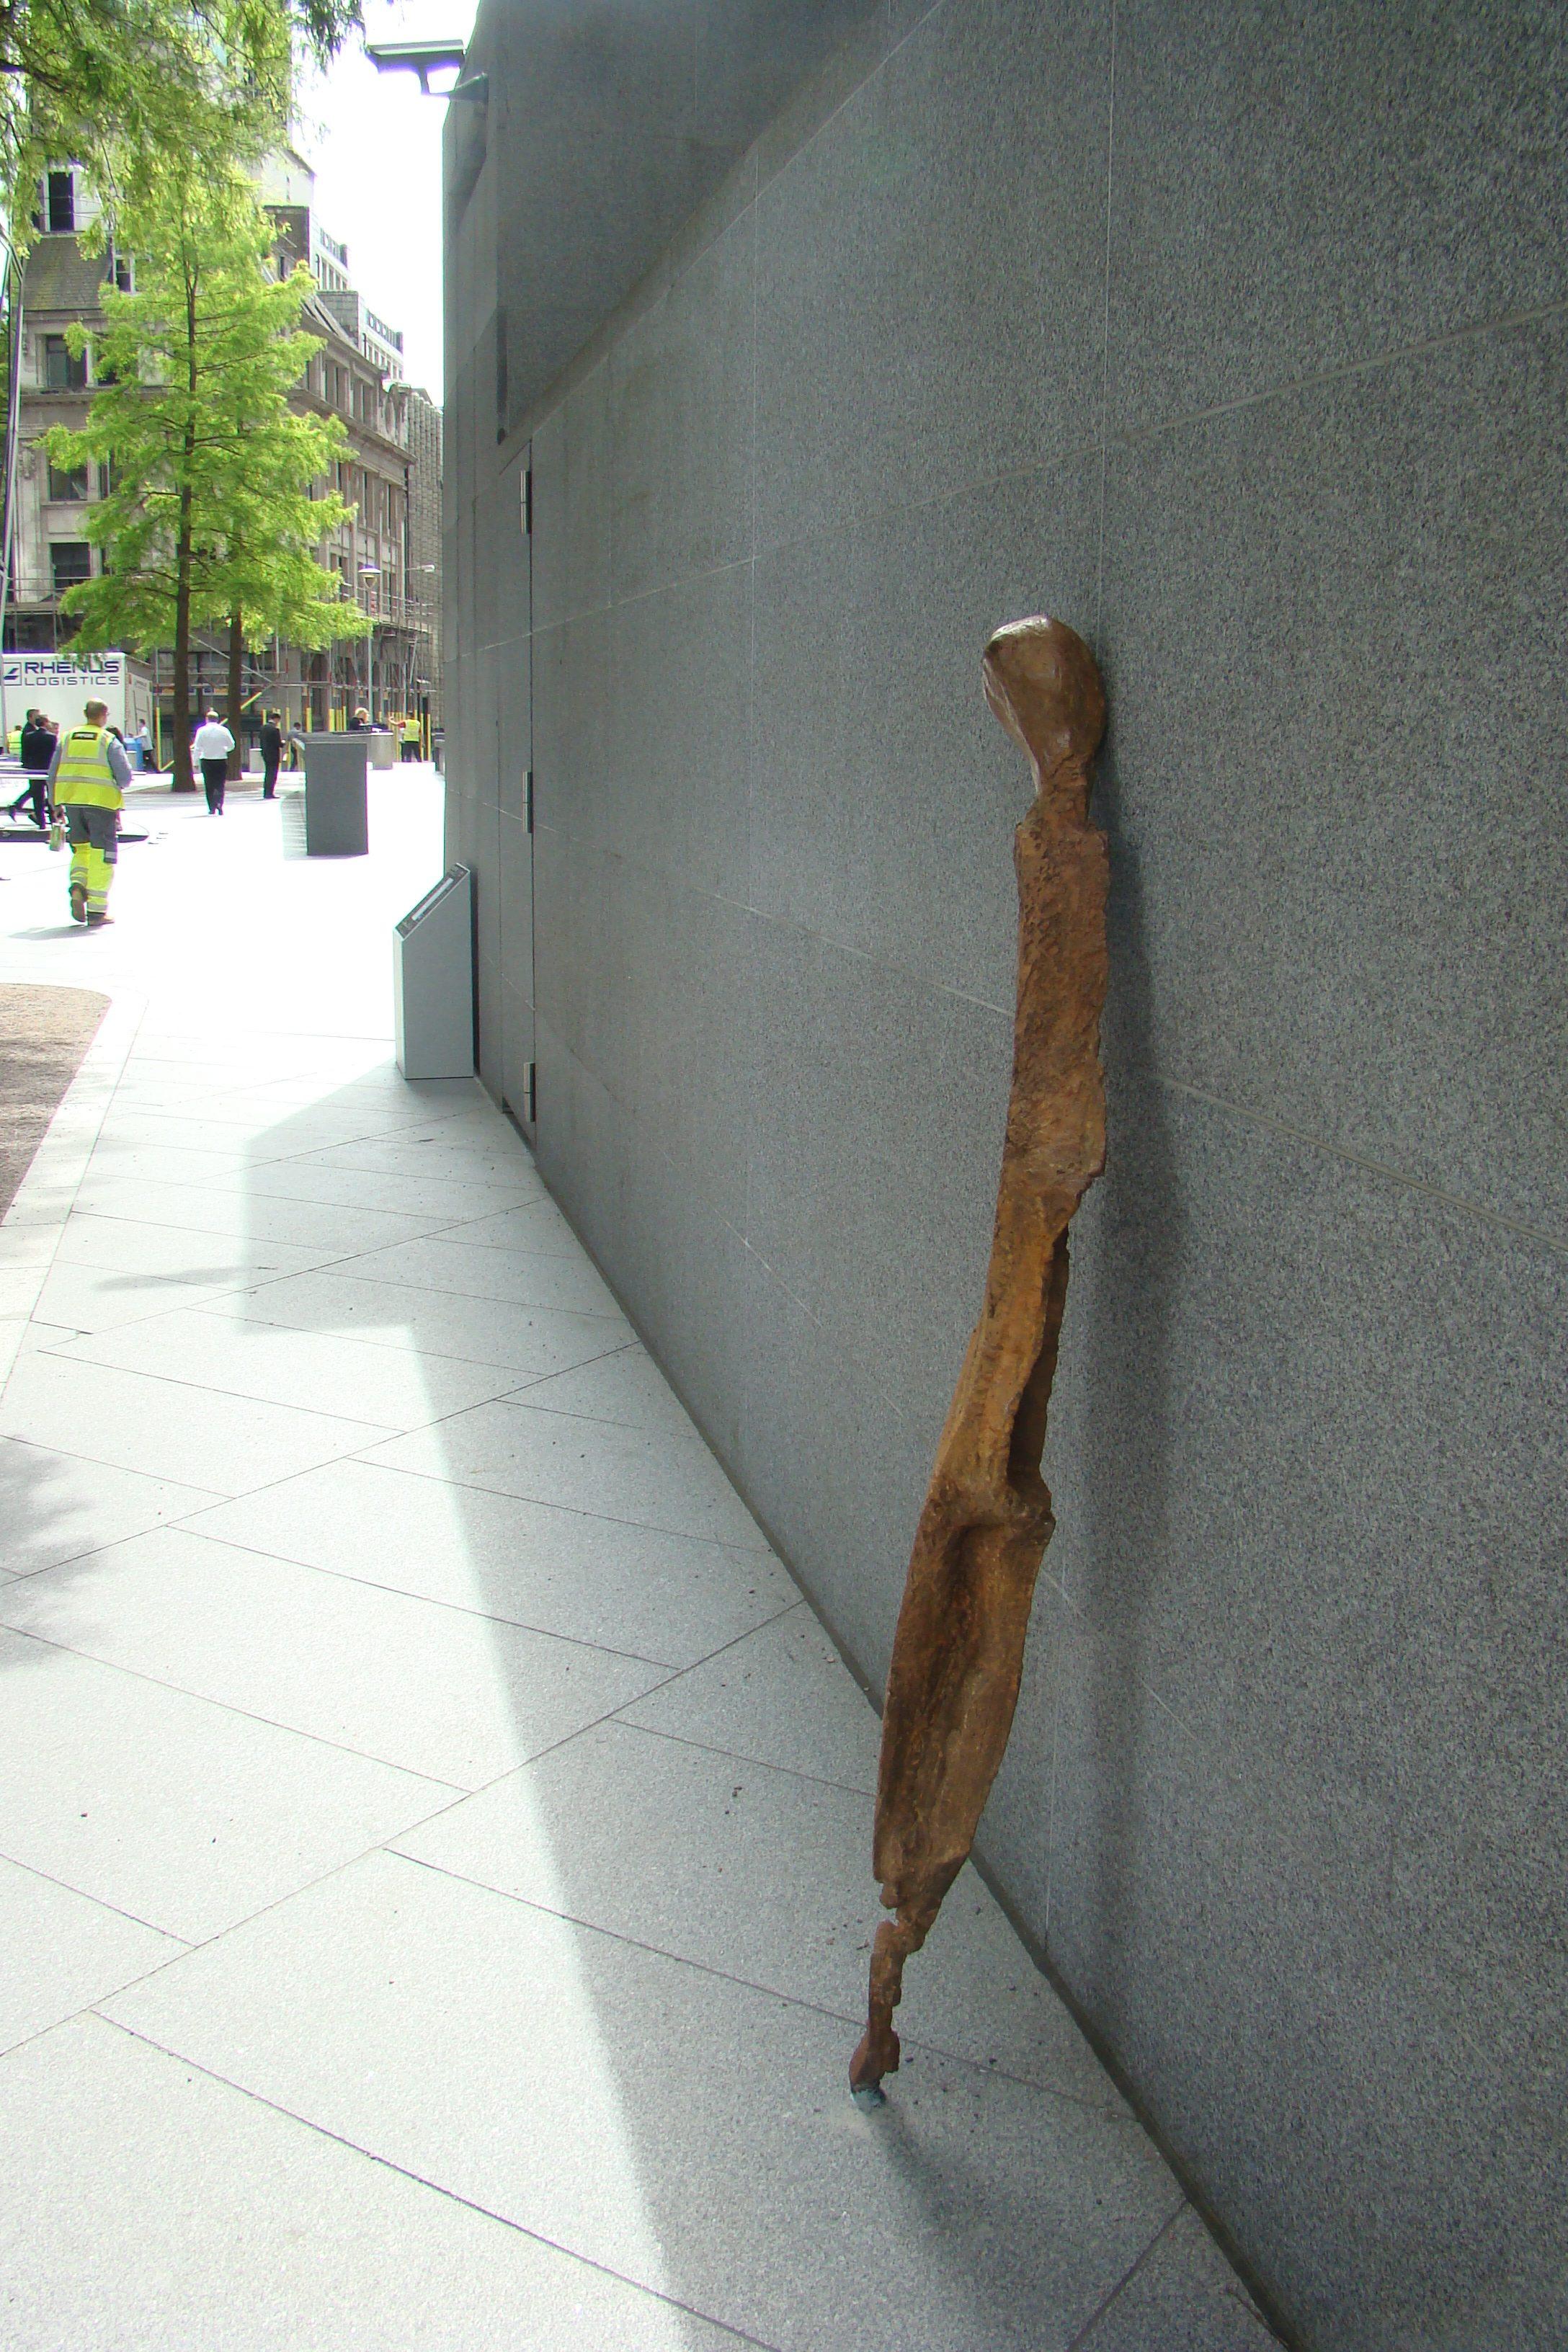 Sculpture in the City 2016, Londra - Enrico David